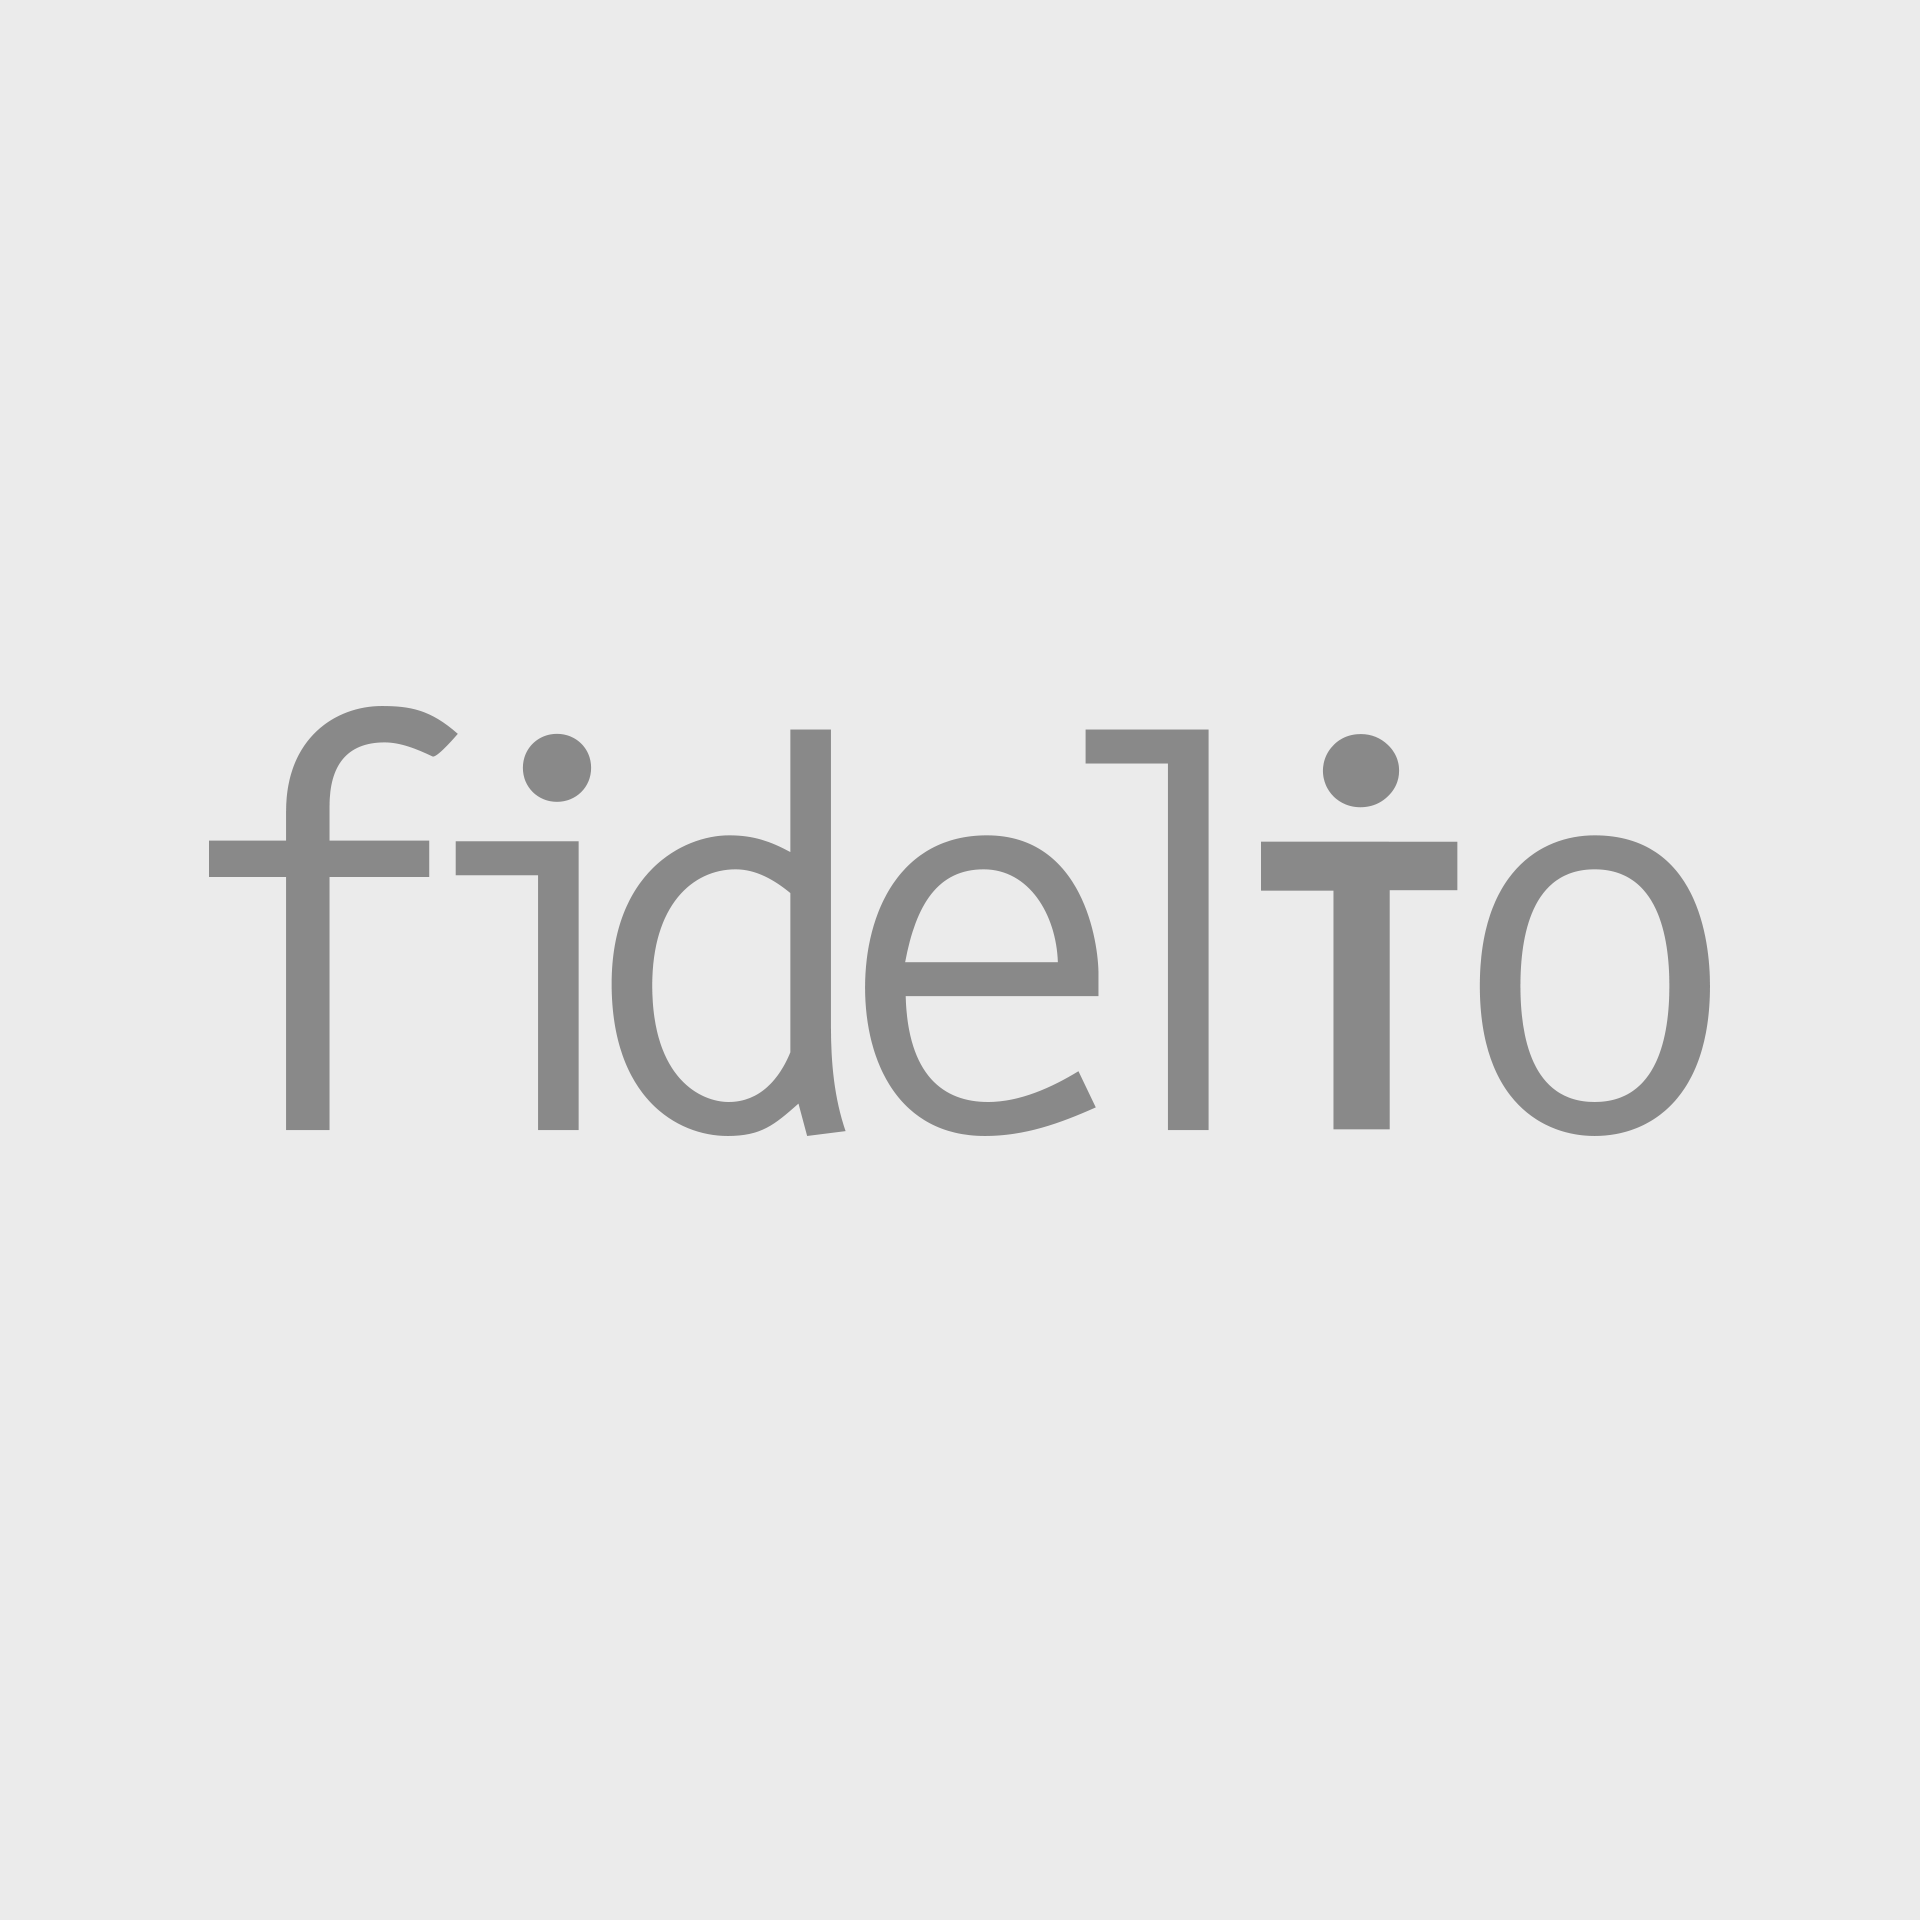 Fidelio Napi Zene – Chick Corea: Round Midnight